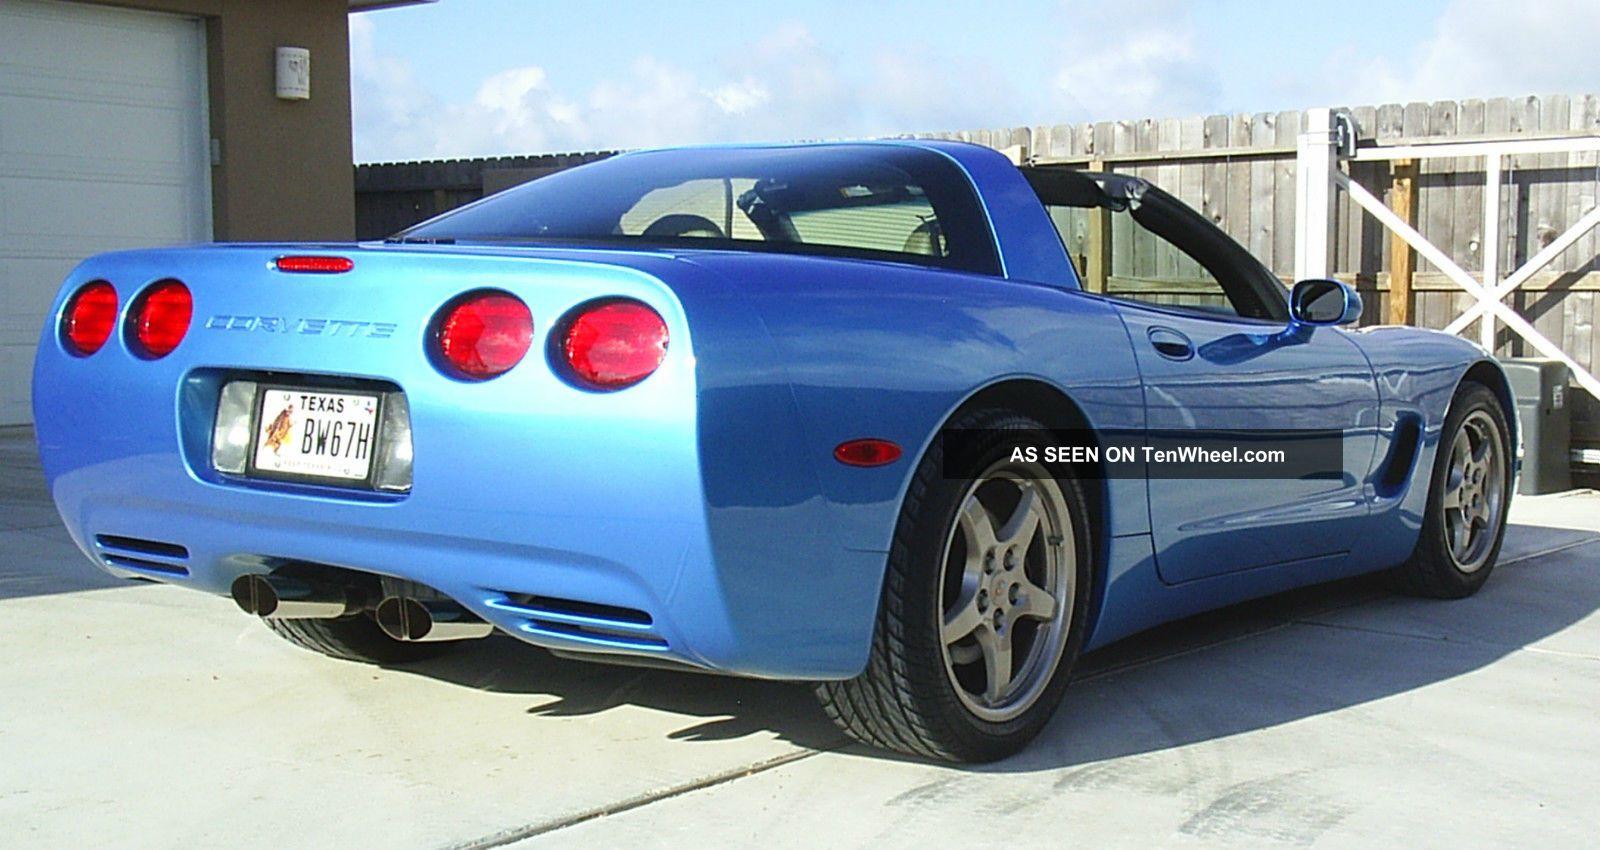 2000 C5 Chevrolet Corvette Coupe Nassau Blue Metallic